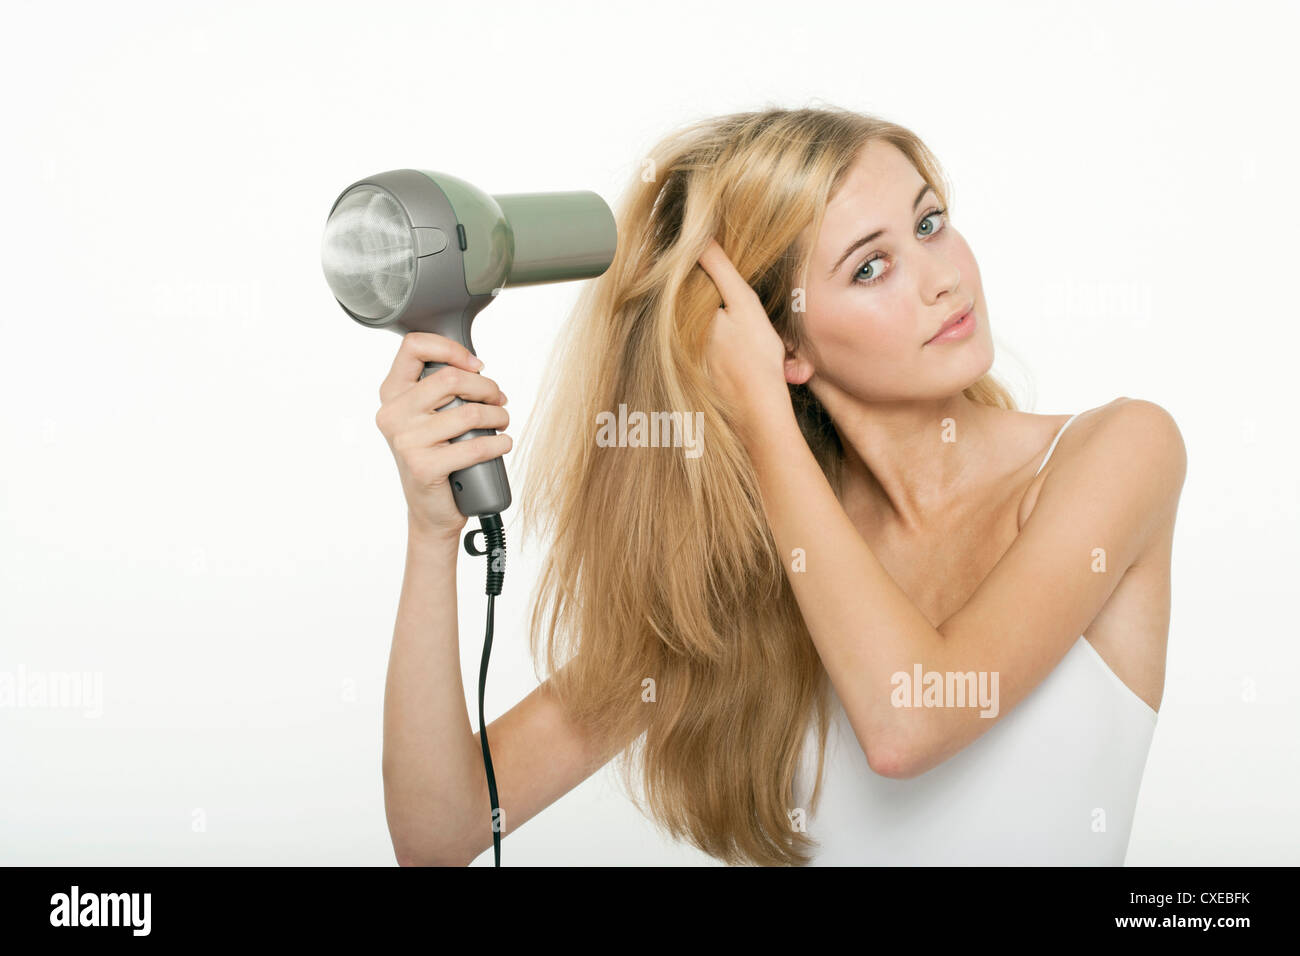 Teen girl using hairdryer - Stock Image